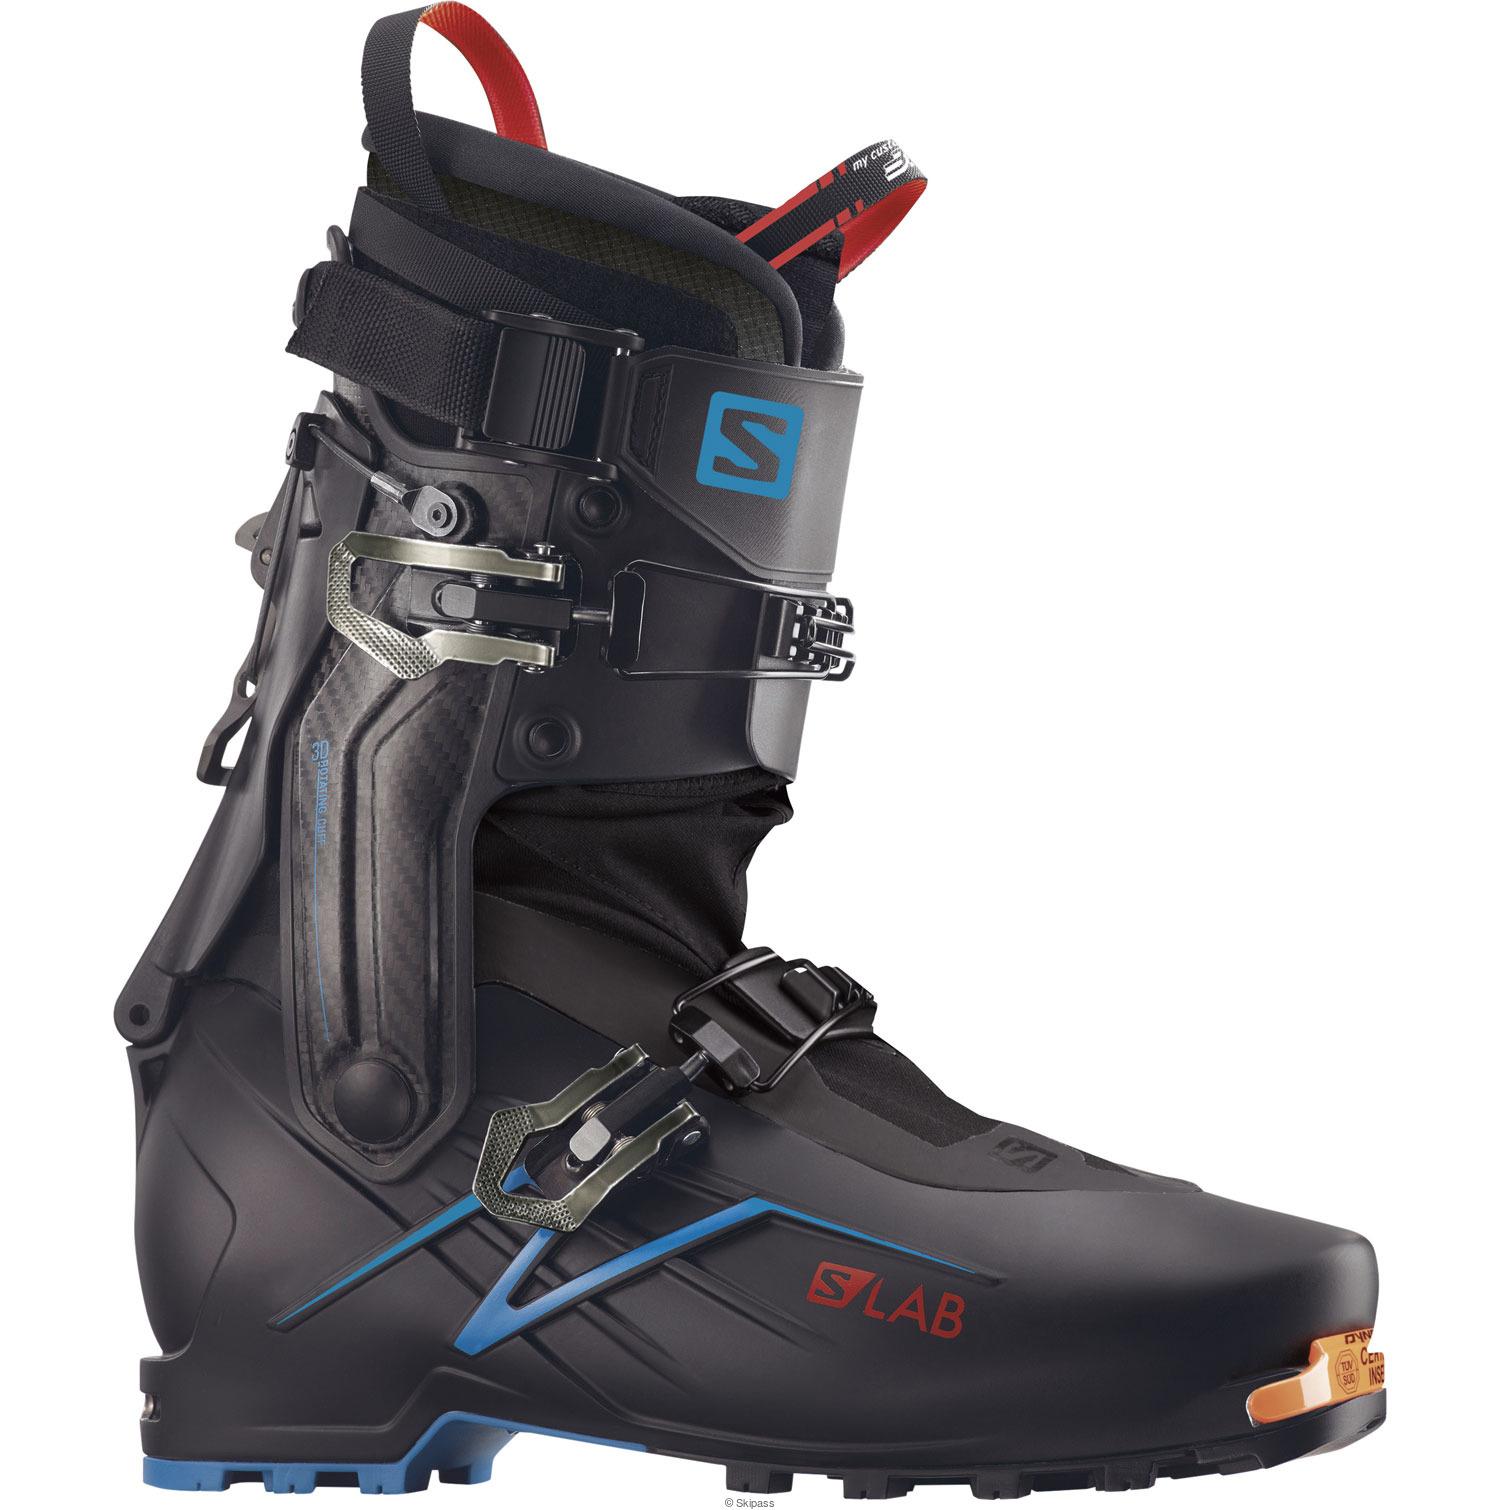 Test Salomon SLab X Alp 2020, avis chaussure ski Randonnée